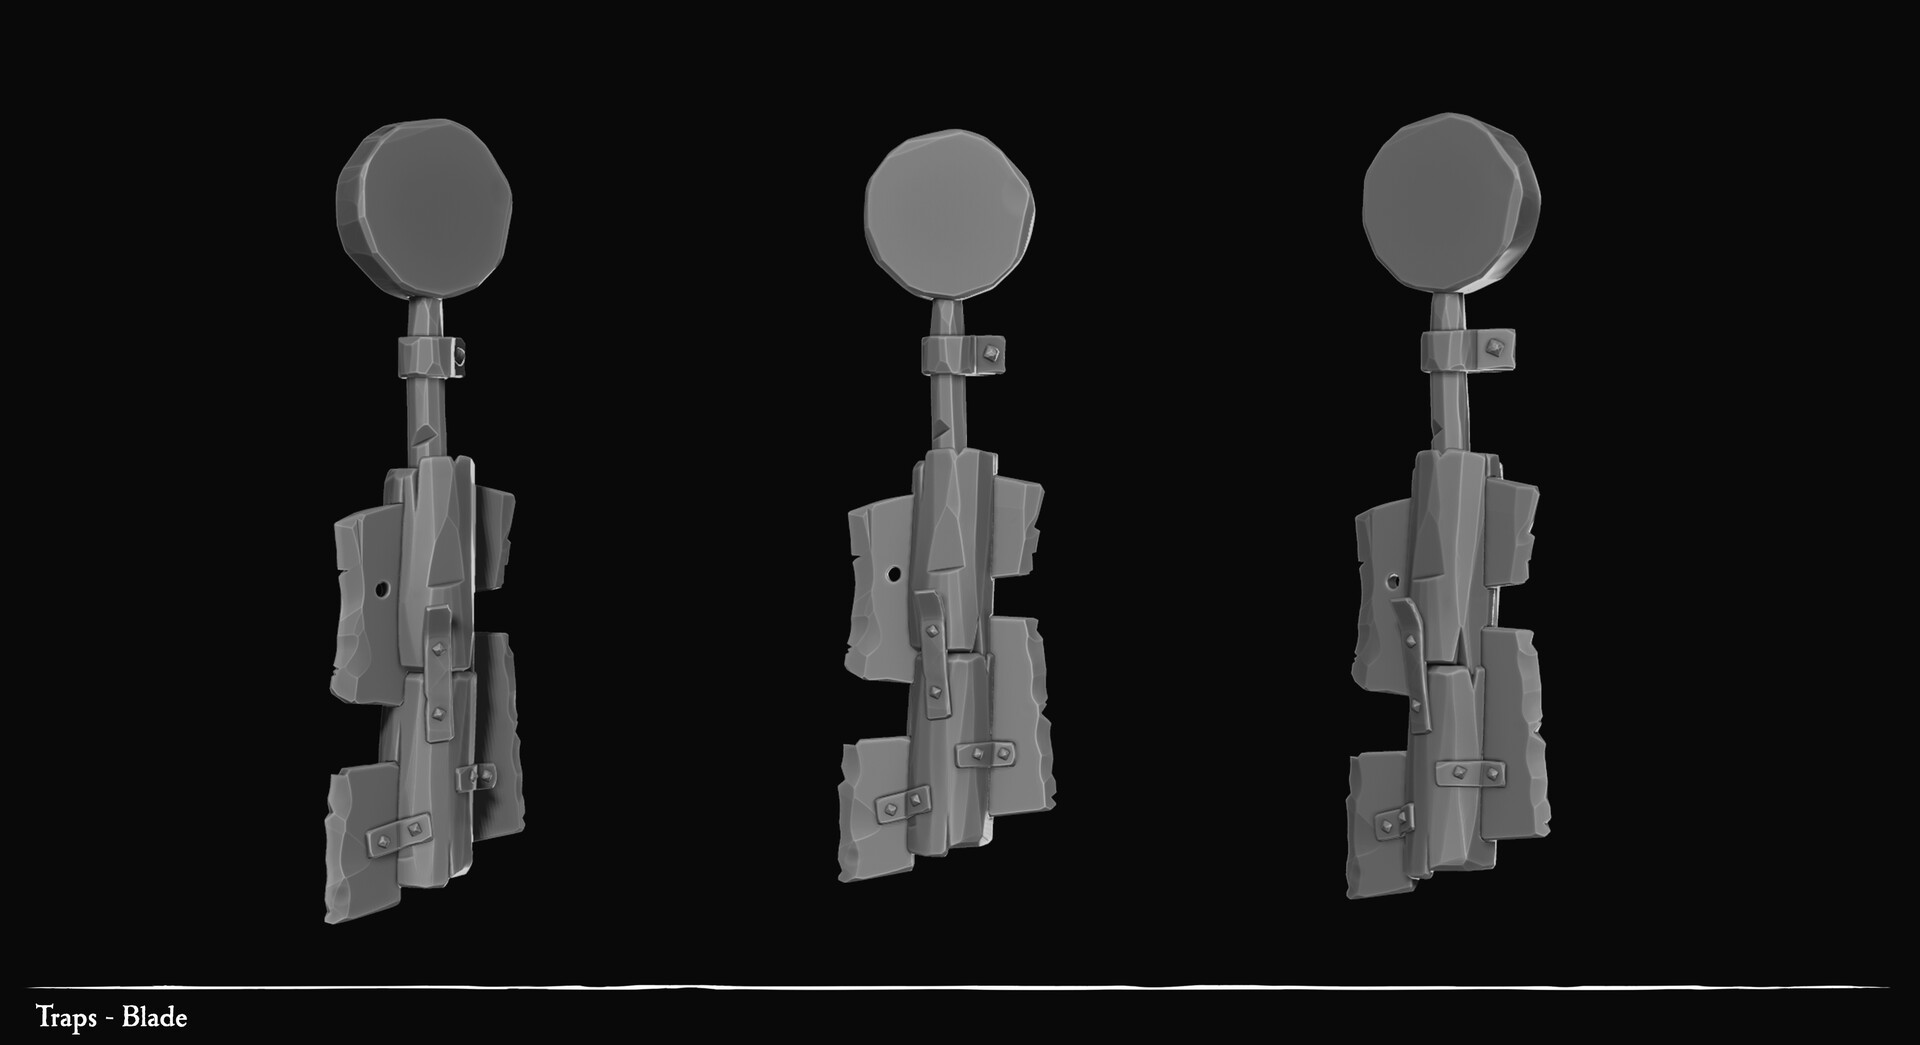 george-o-keeffe-14-sot-traps-blade-sculpt.jpg